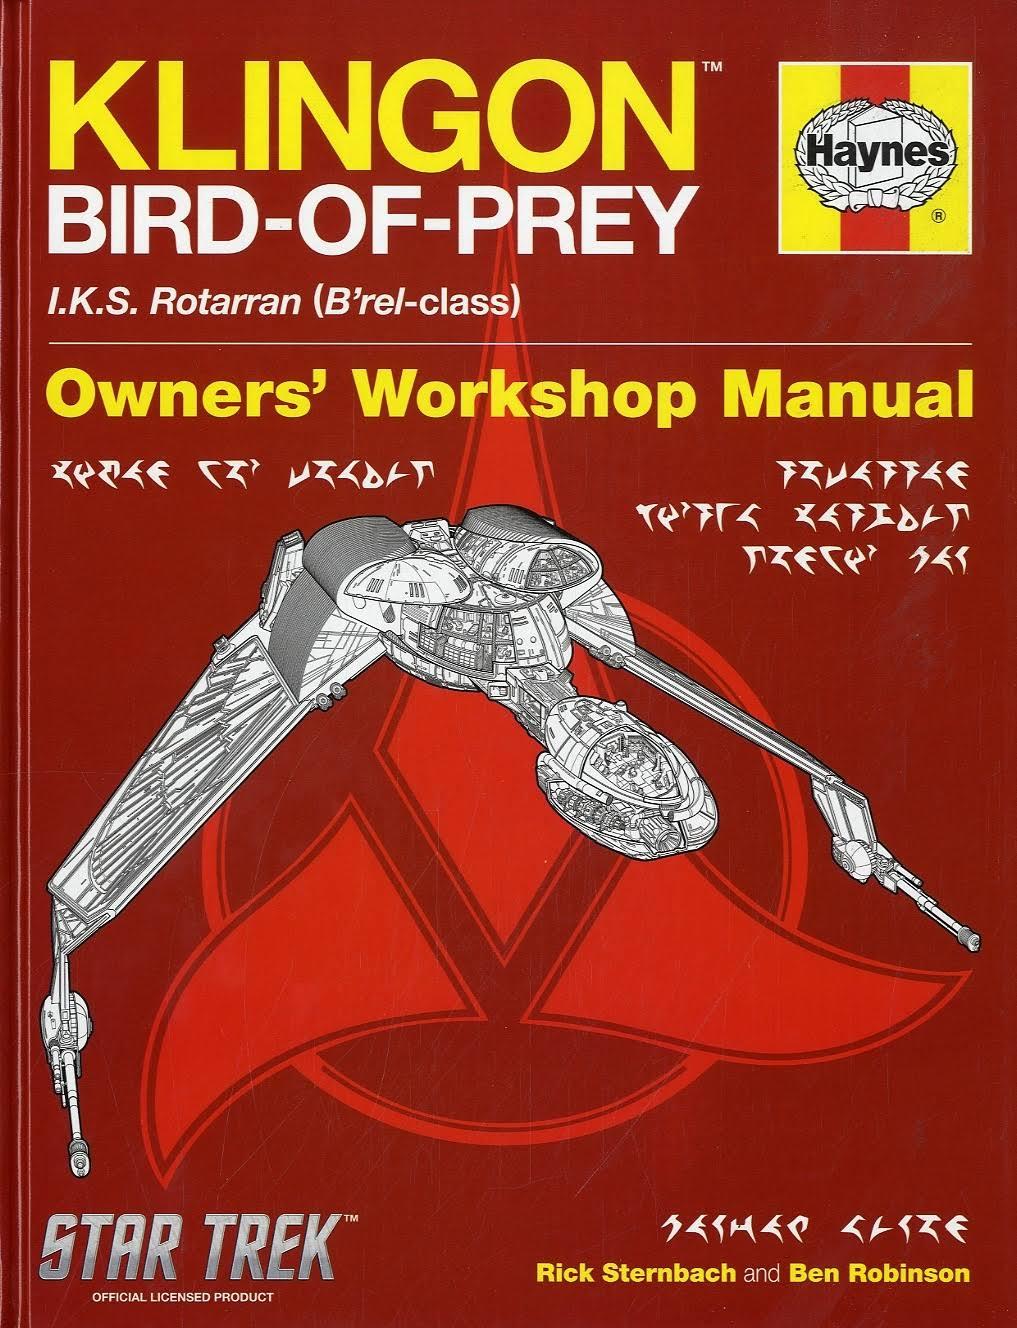 Klingon bird of prey star trek Haynes manual just £1 at poundland